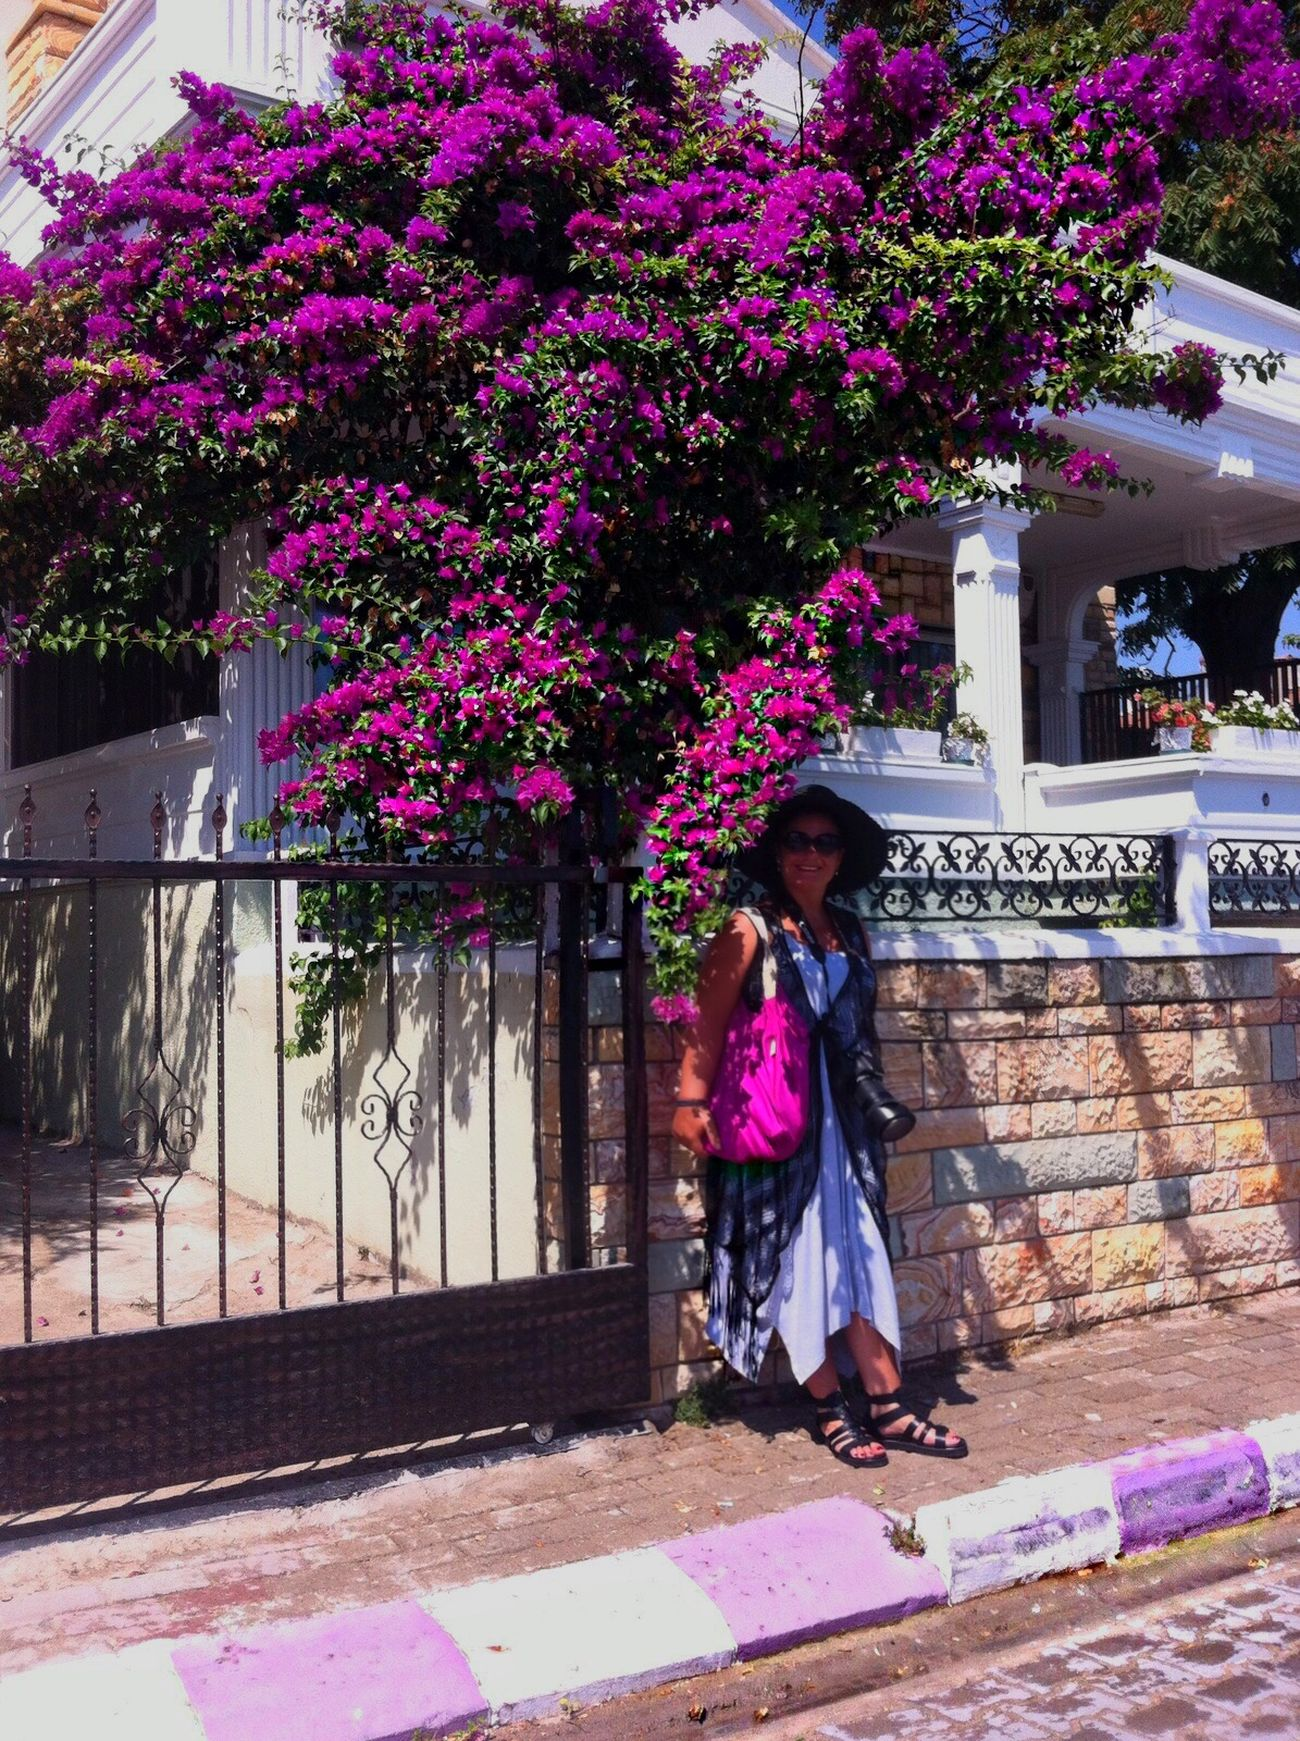 Izmir EyeEm Best Shots Pink Flower MyPhotography EyeEm Gallery EyeEm Summer ☀ Relaxing Flowers Summer2015